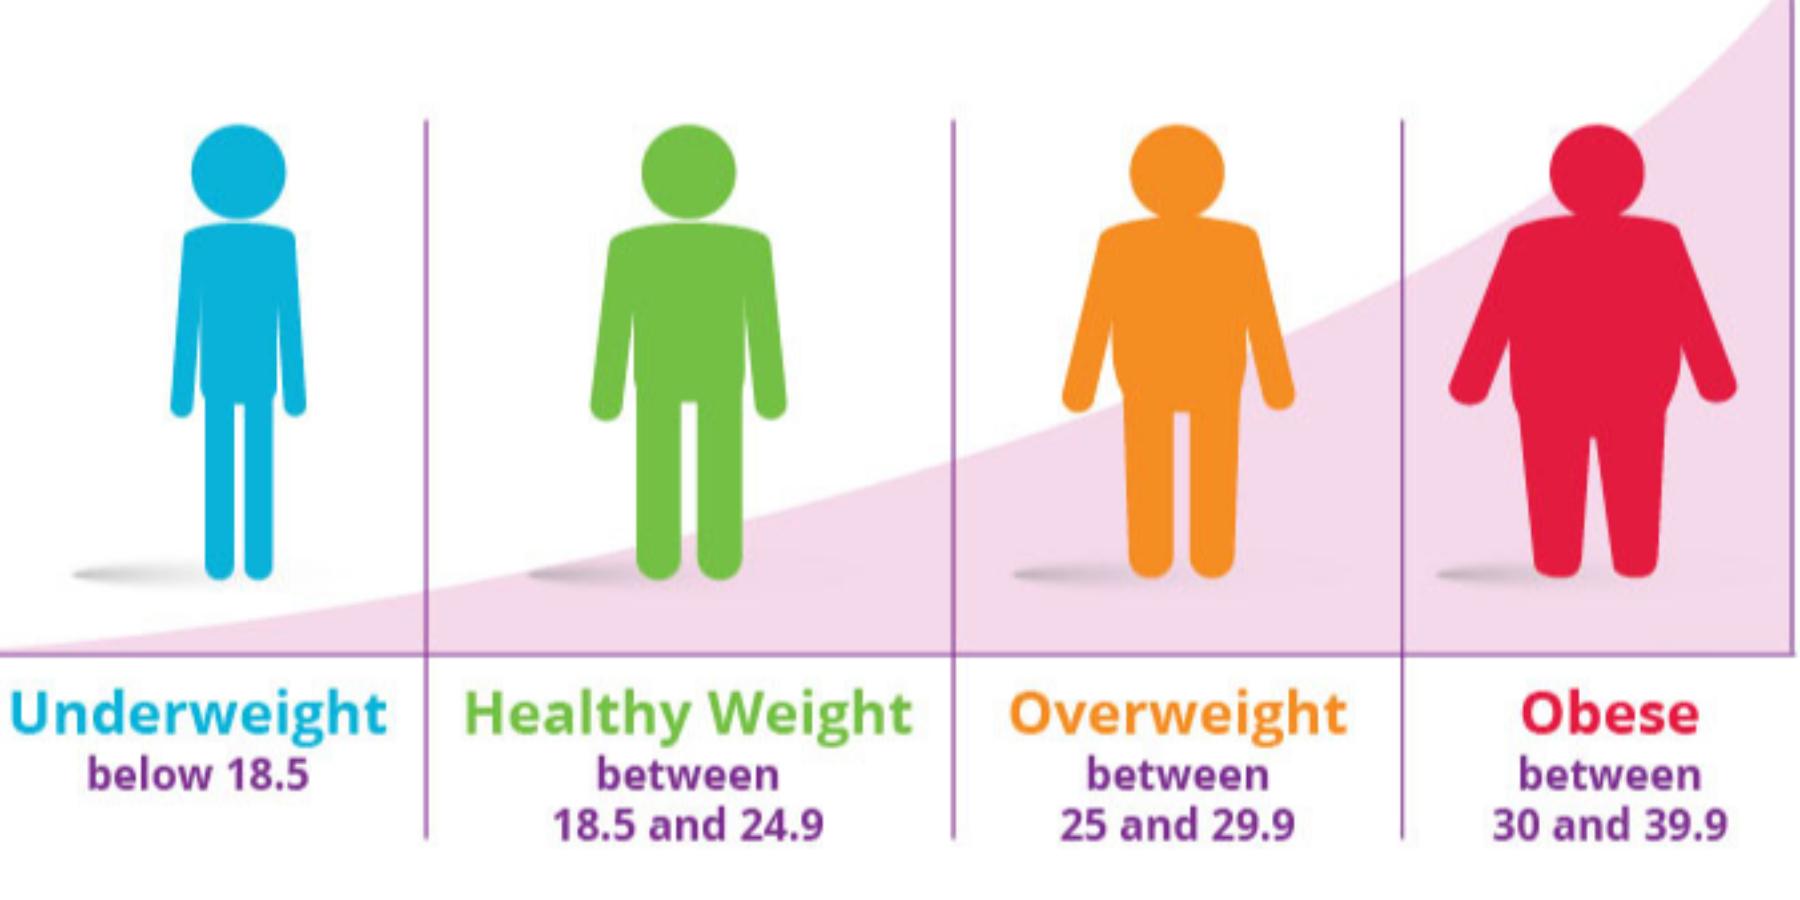 pH foods (With images) | Nutriție, Diete sănătoase, Alimente sănătoase